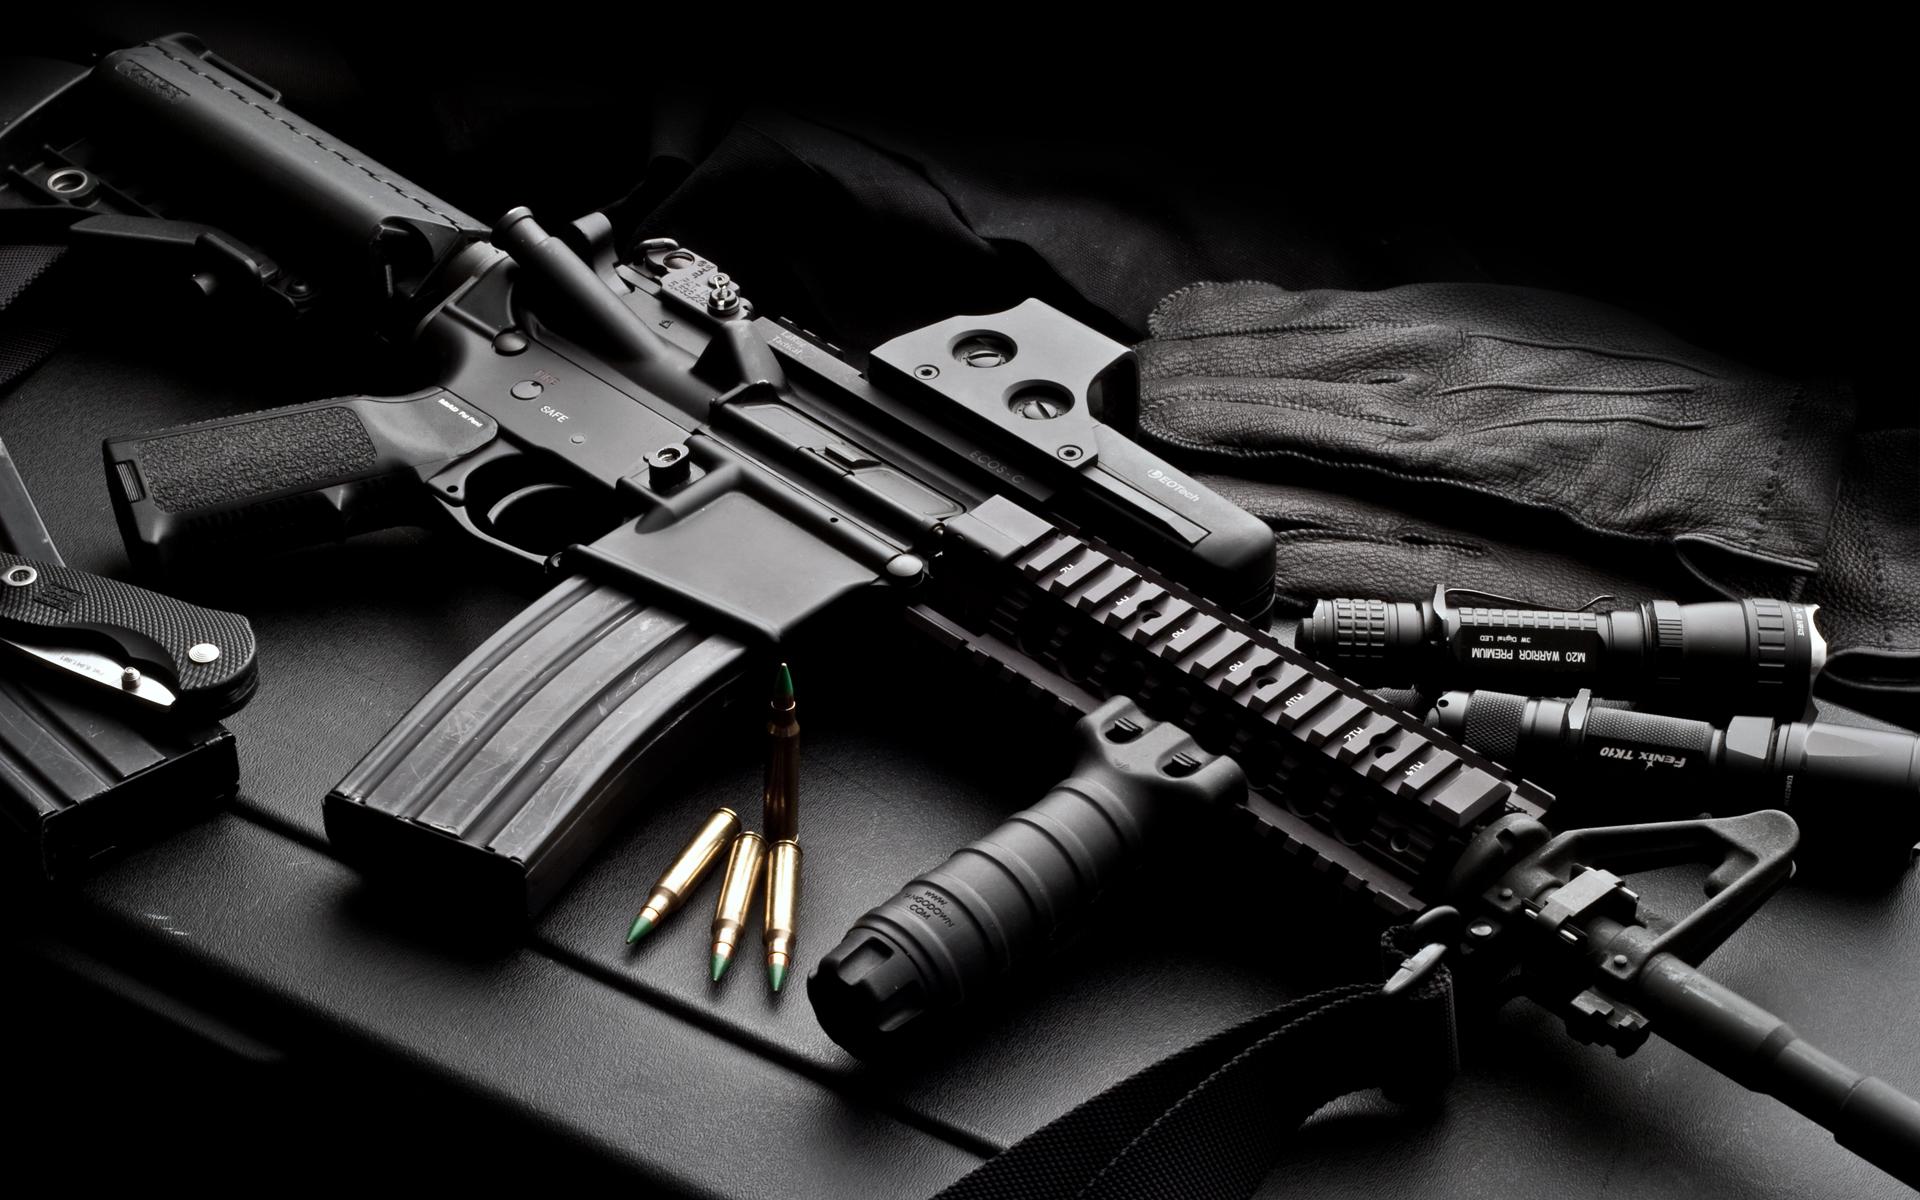 207 Assault Rifle HD Wallpapers Backgrounds 1920x1200